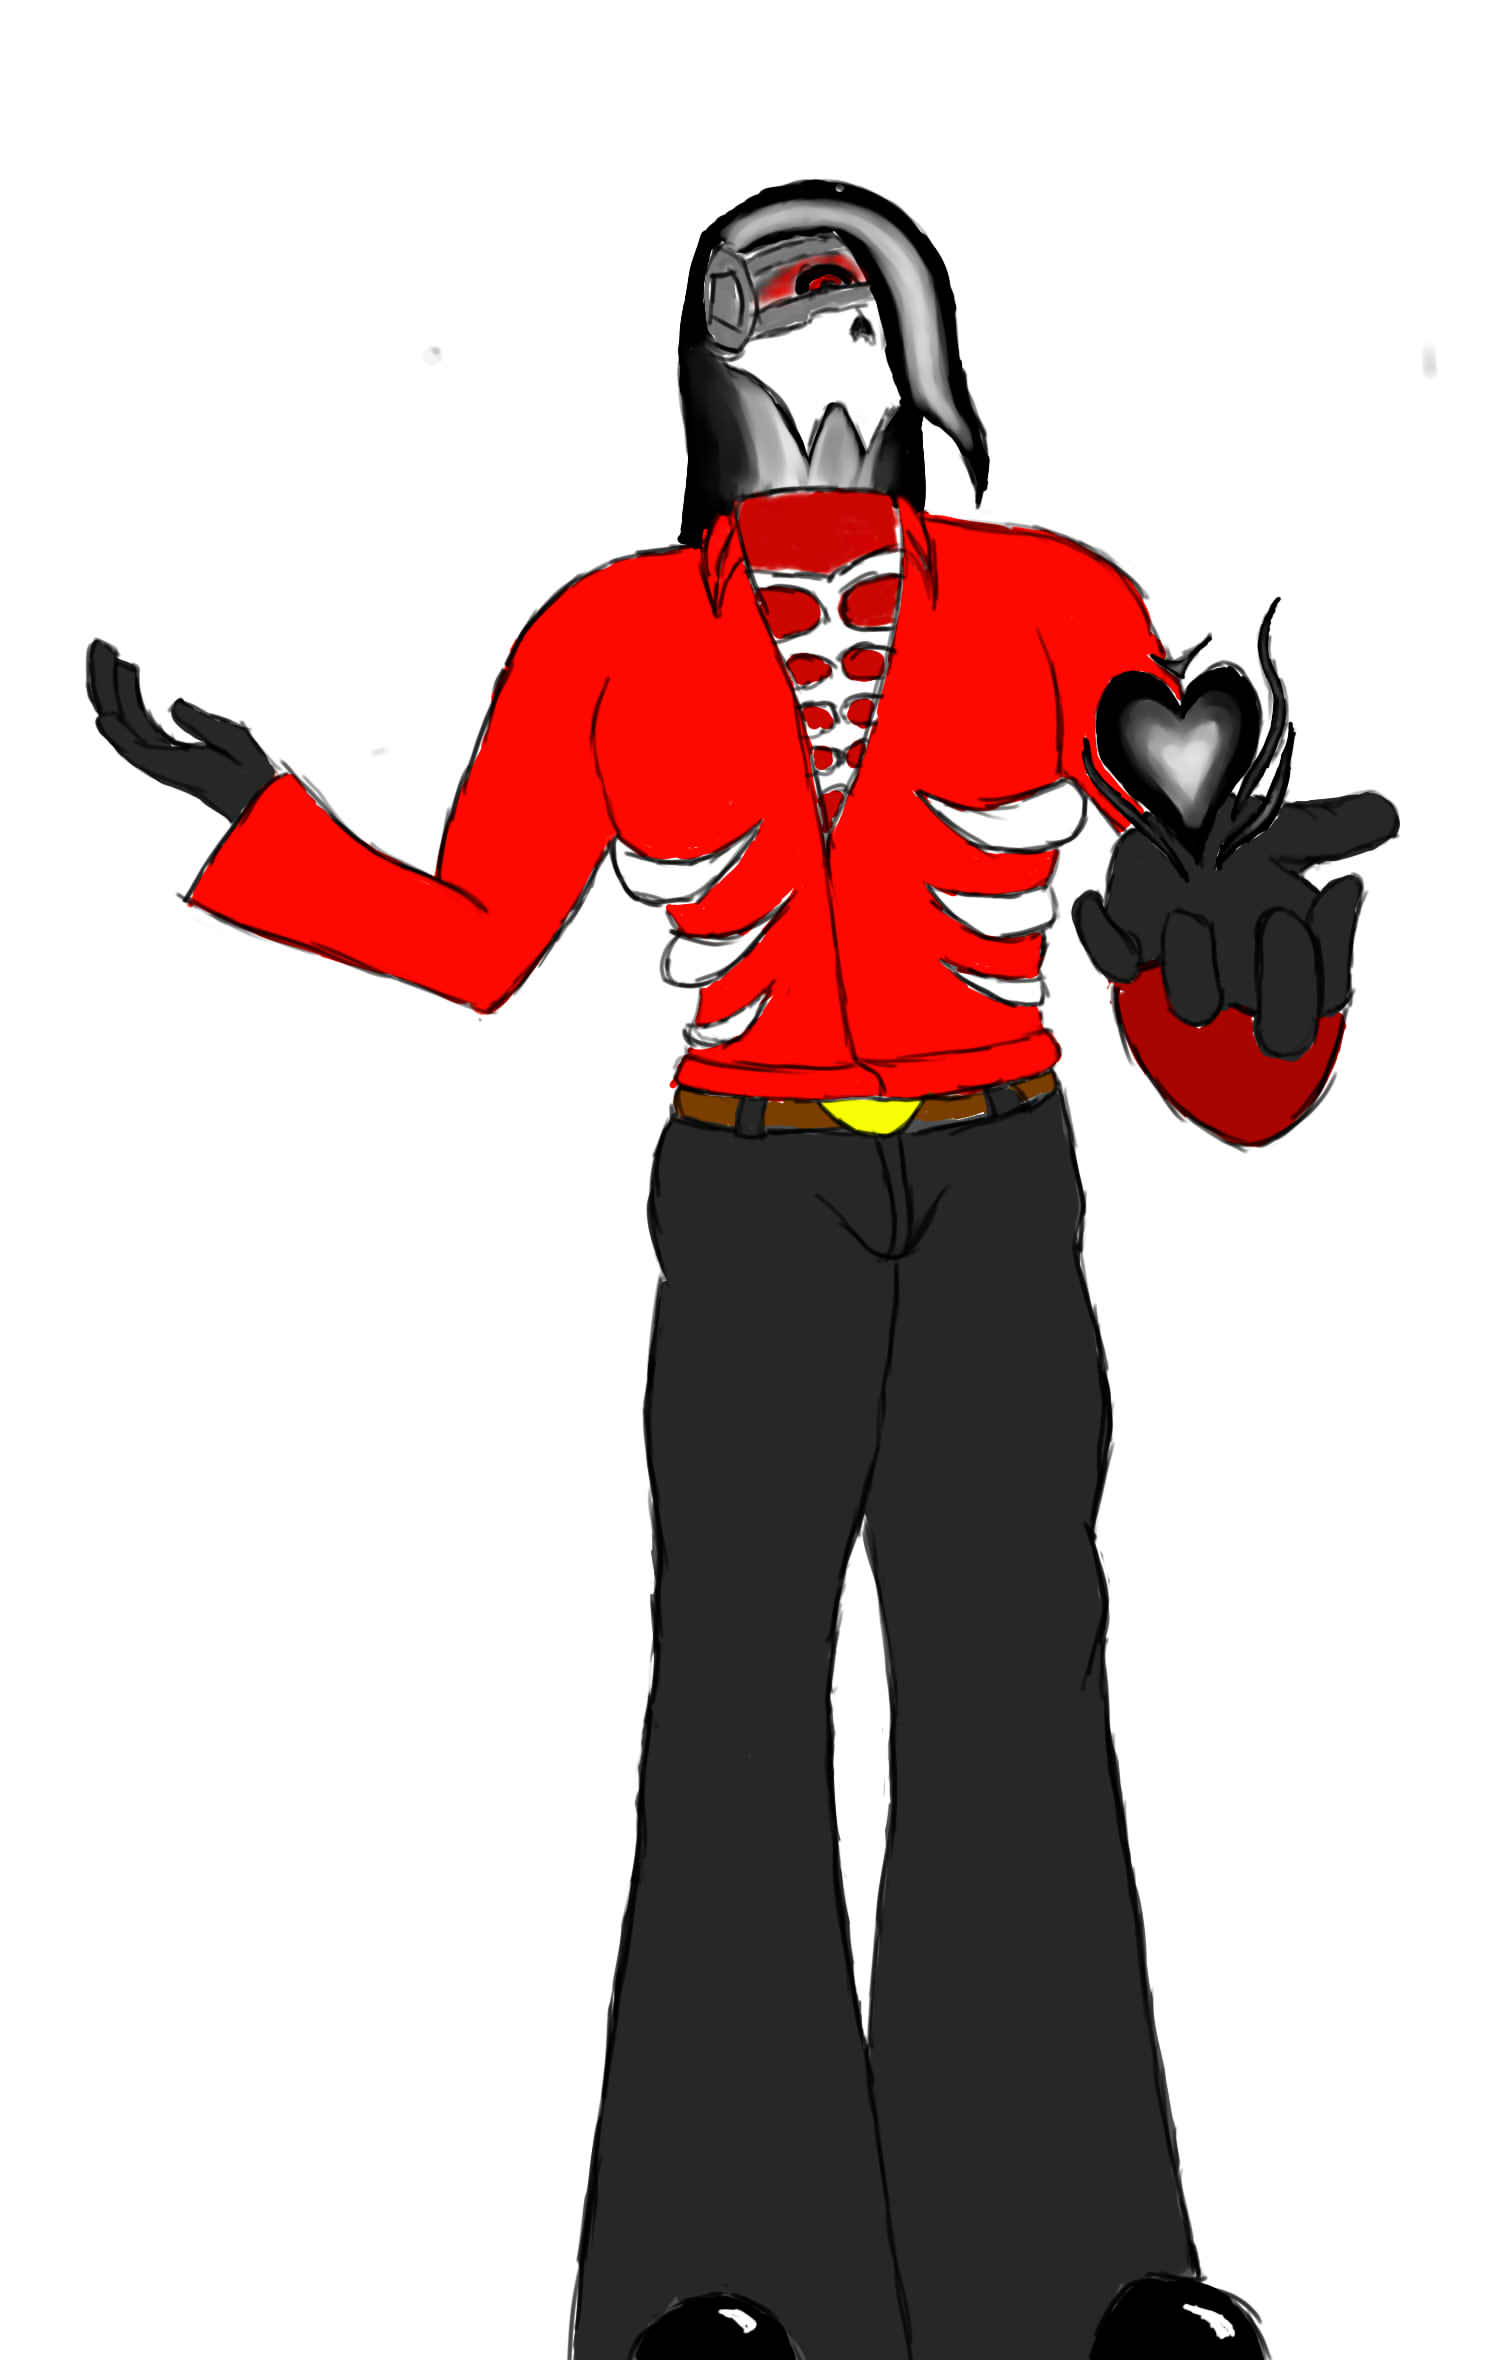 mystery skull persona (my persona similar as luwis in mystery skulls